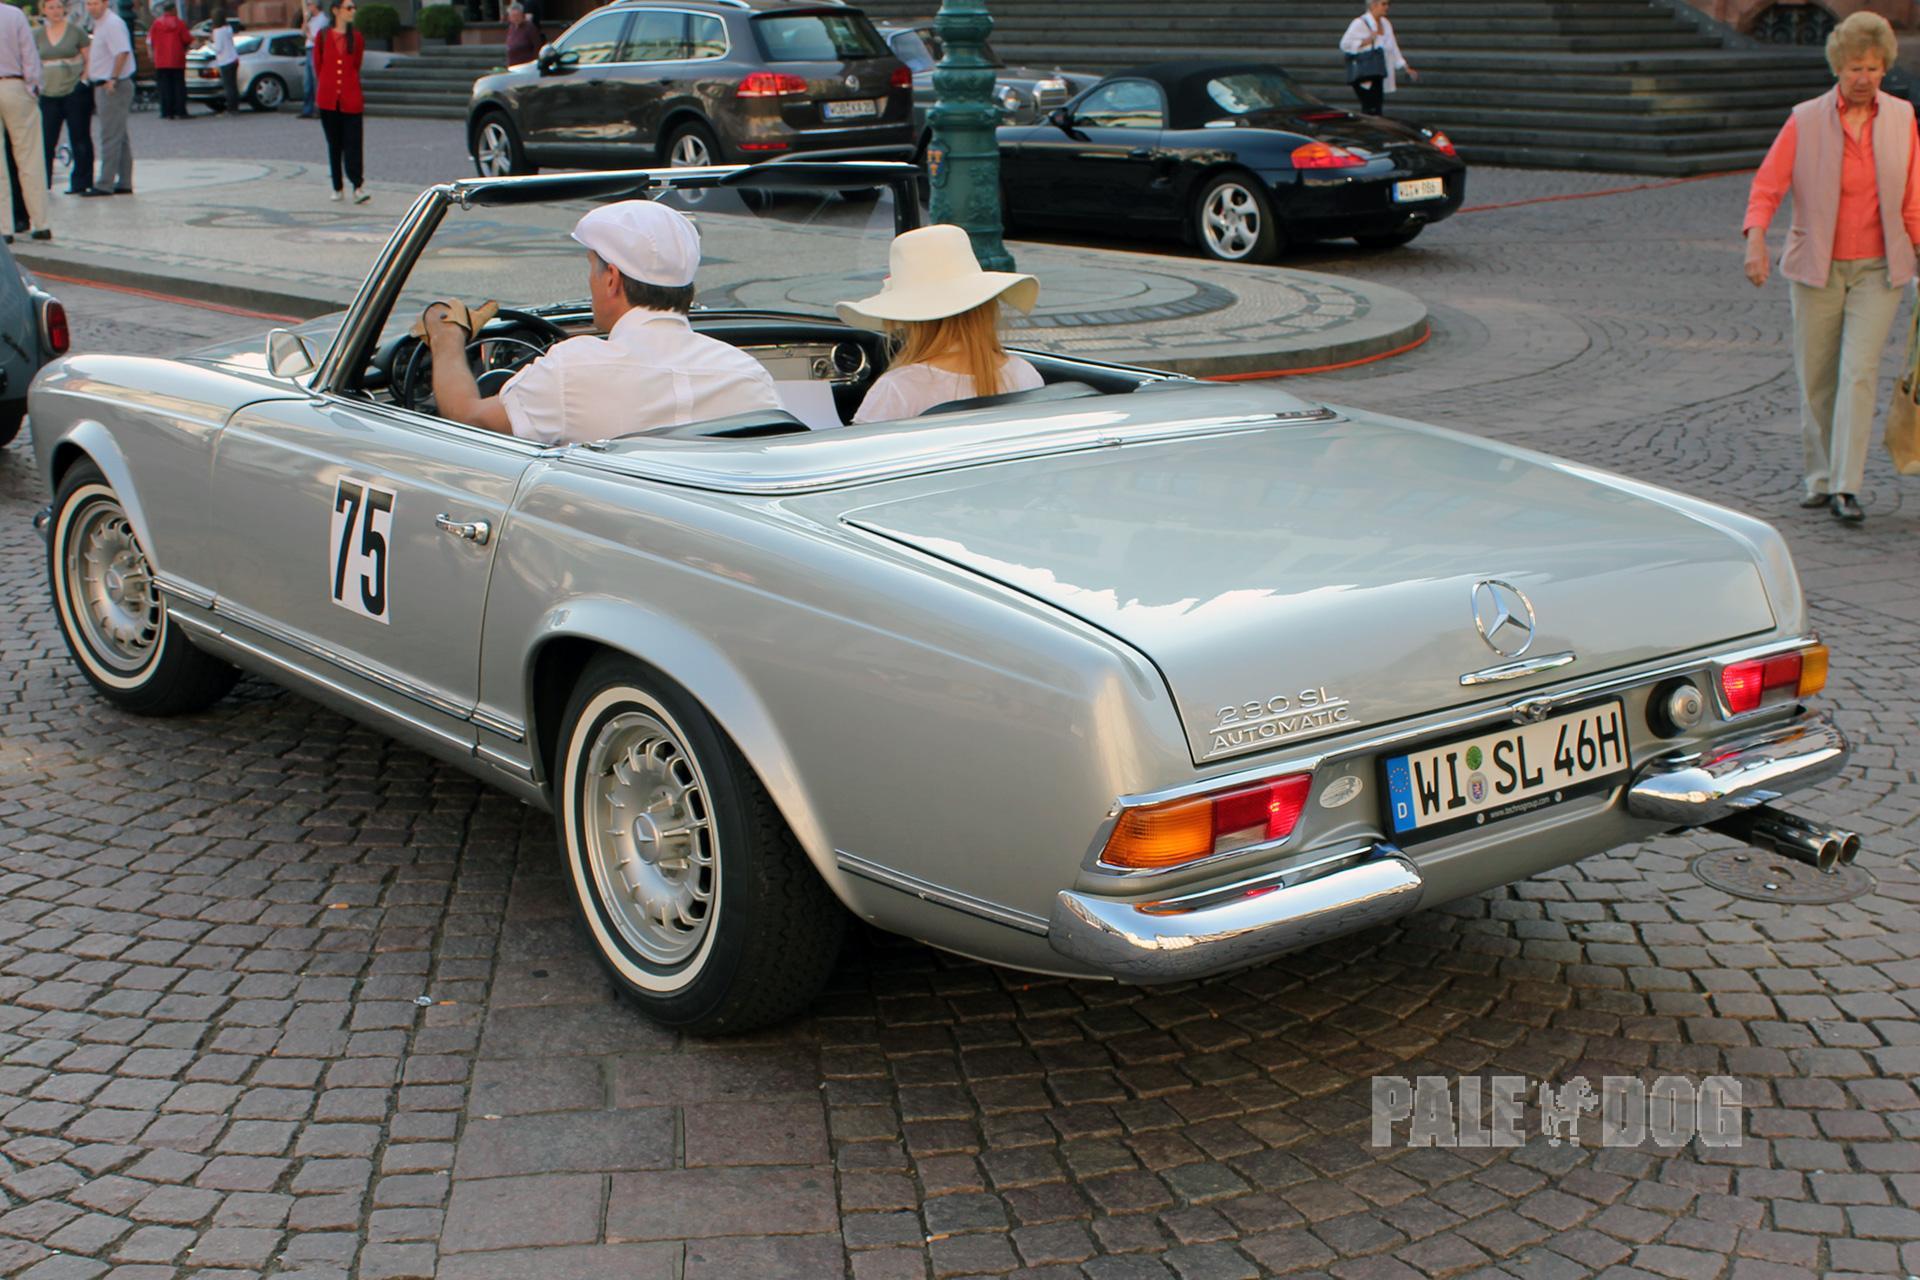 1964 mercedes benz 230 sl rear view 1960s paledog for 1964 mercedes benz 230sl